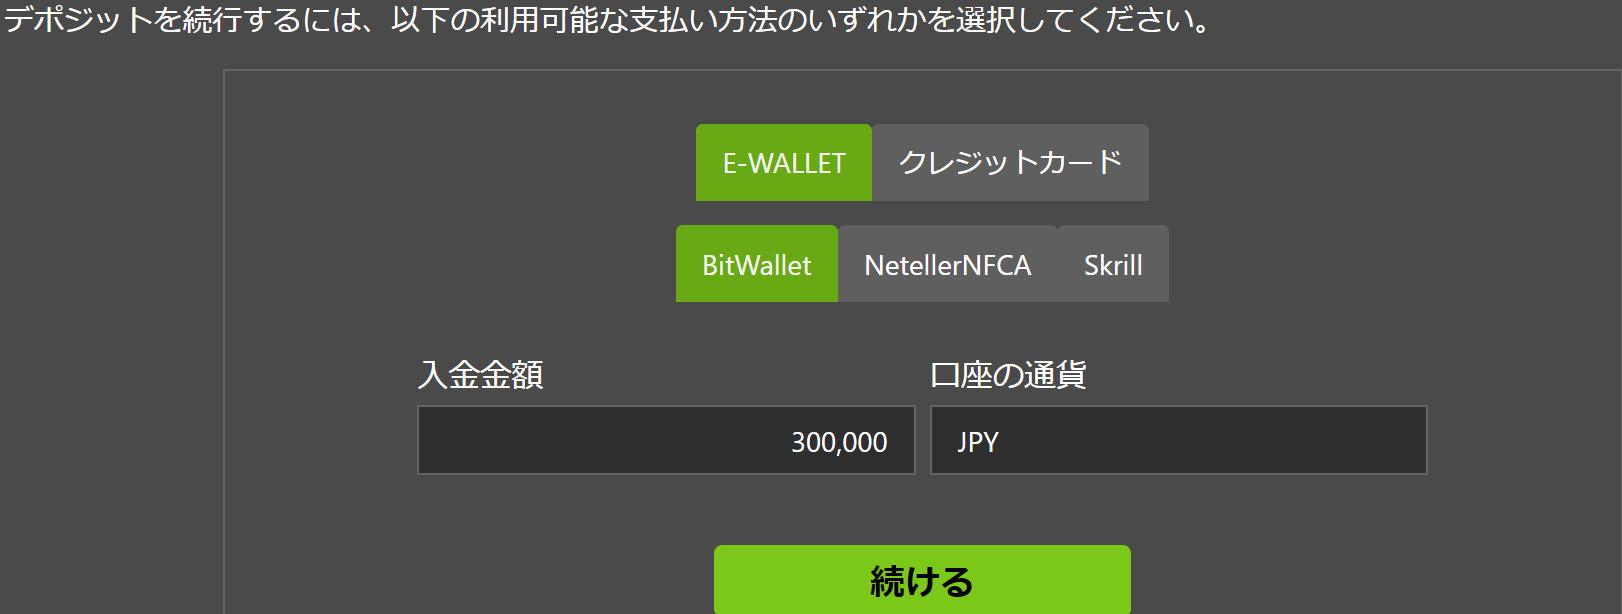 GKFXのBitwalletでの入金方法1